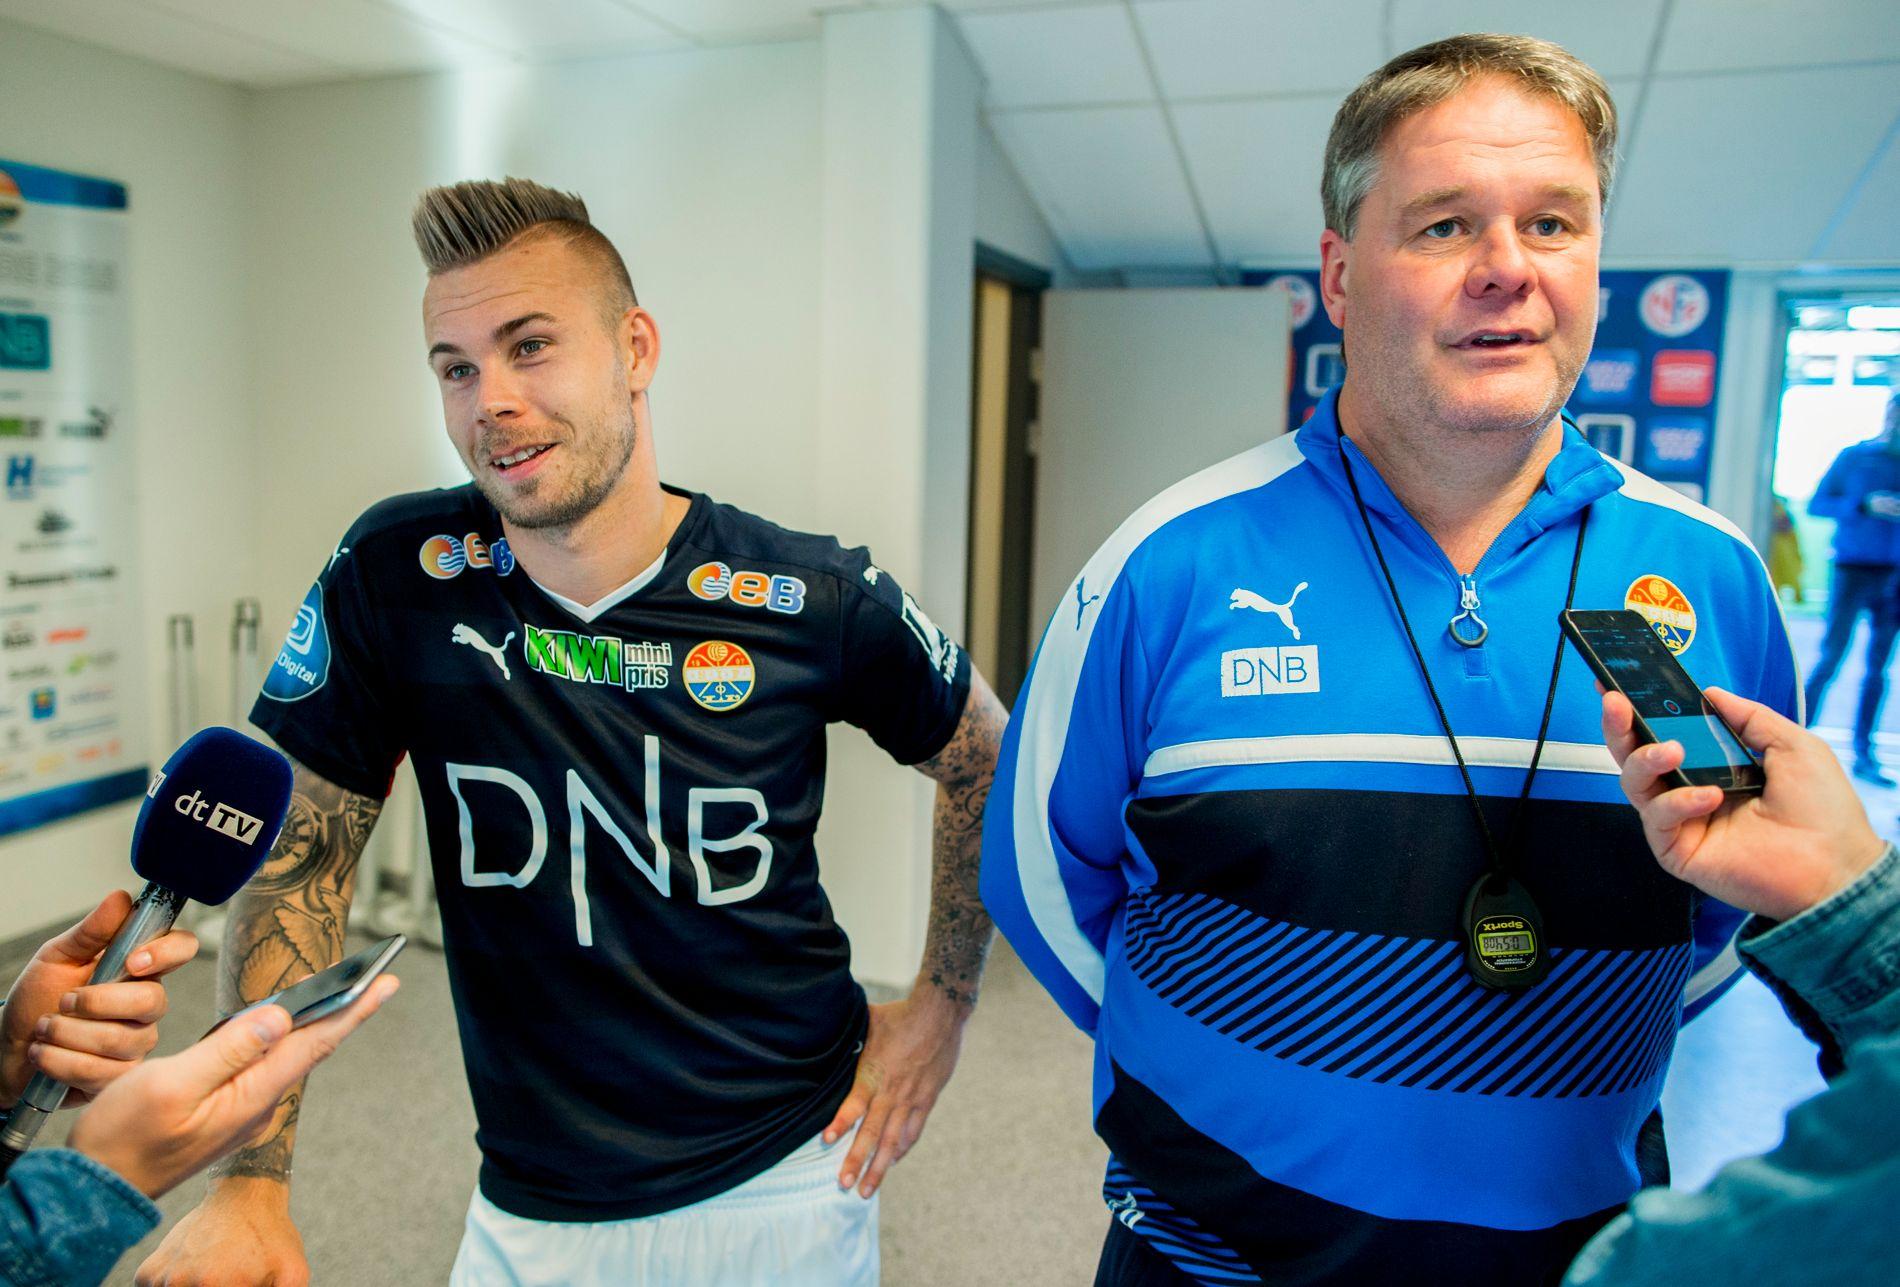 DYNAMISK DUO: Marcus Pedersen og Bjørn Petter Ingebretsen er sammen en uslåelig duo. Her etter en 1–0-seier over Stabæk i cupen i 2016.